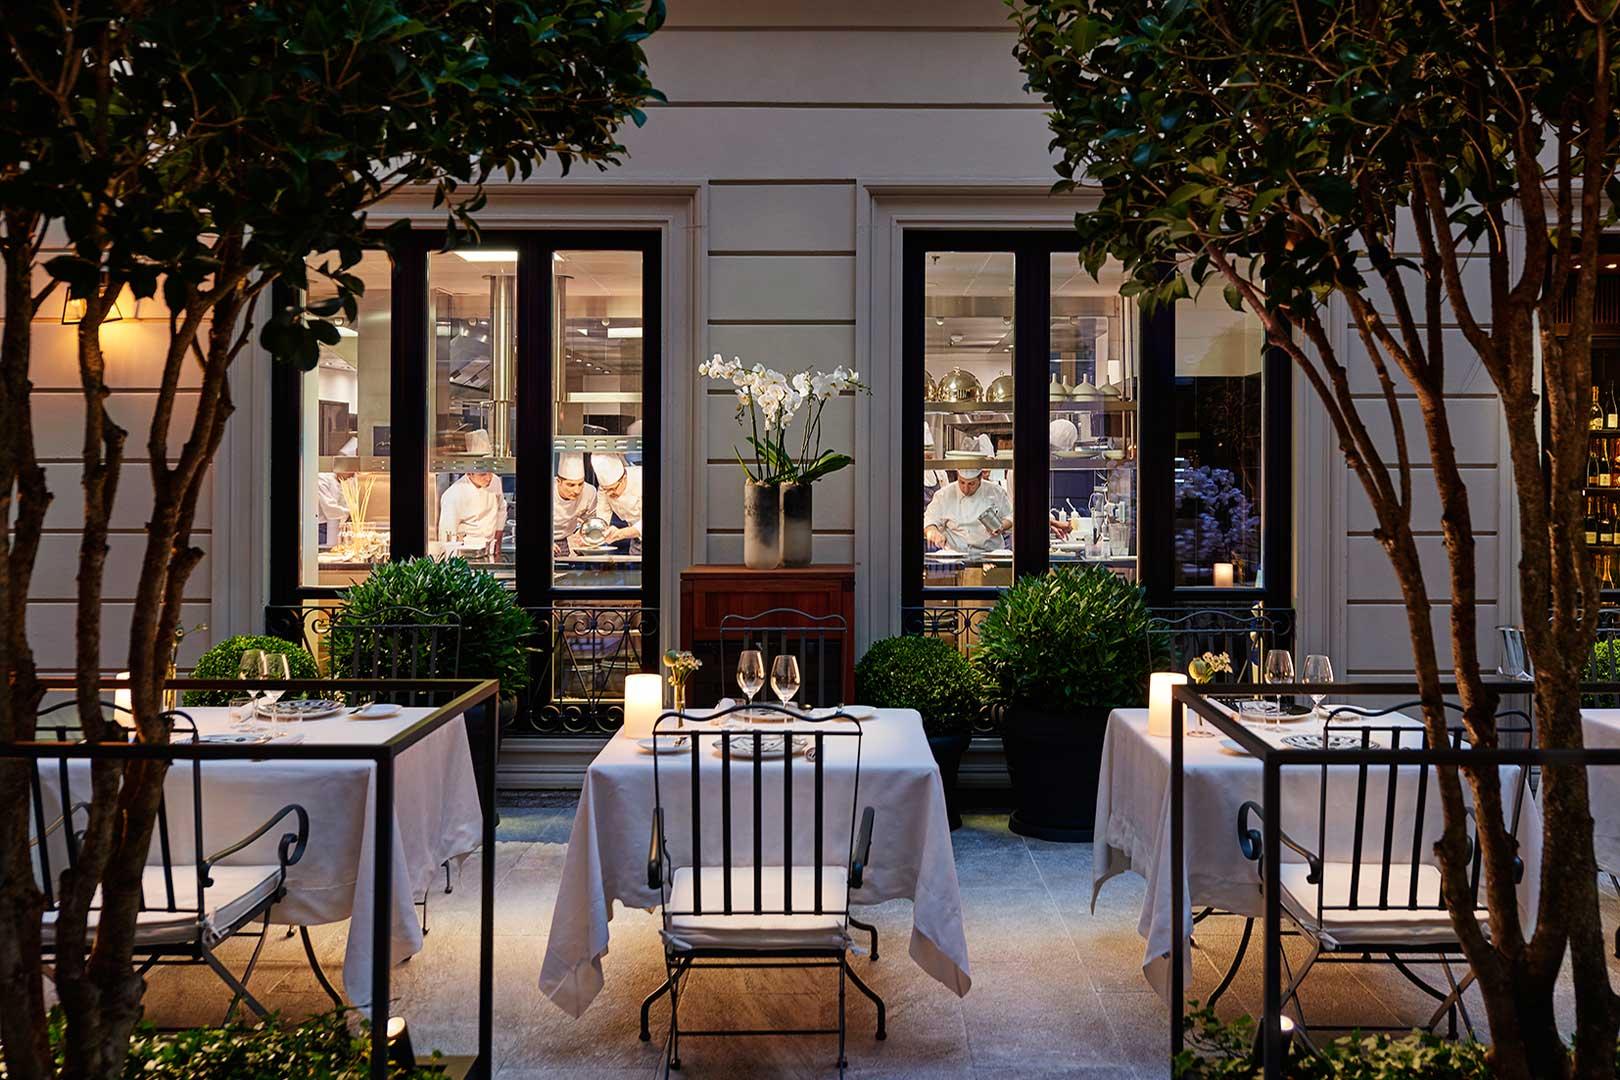 Ristorante Seta - Mandarin Oriental Hotel Milano